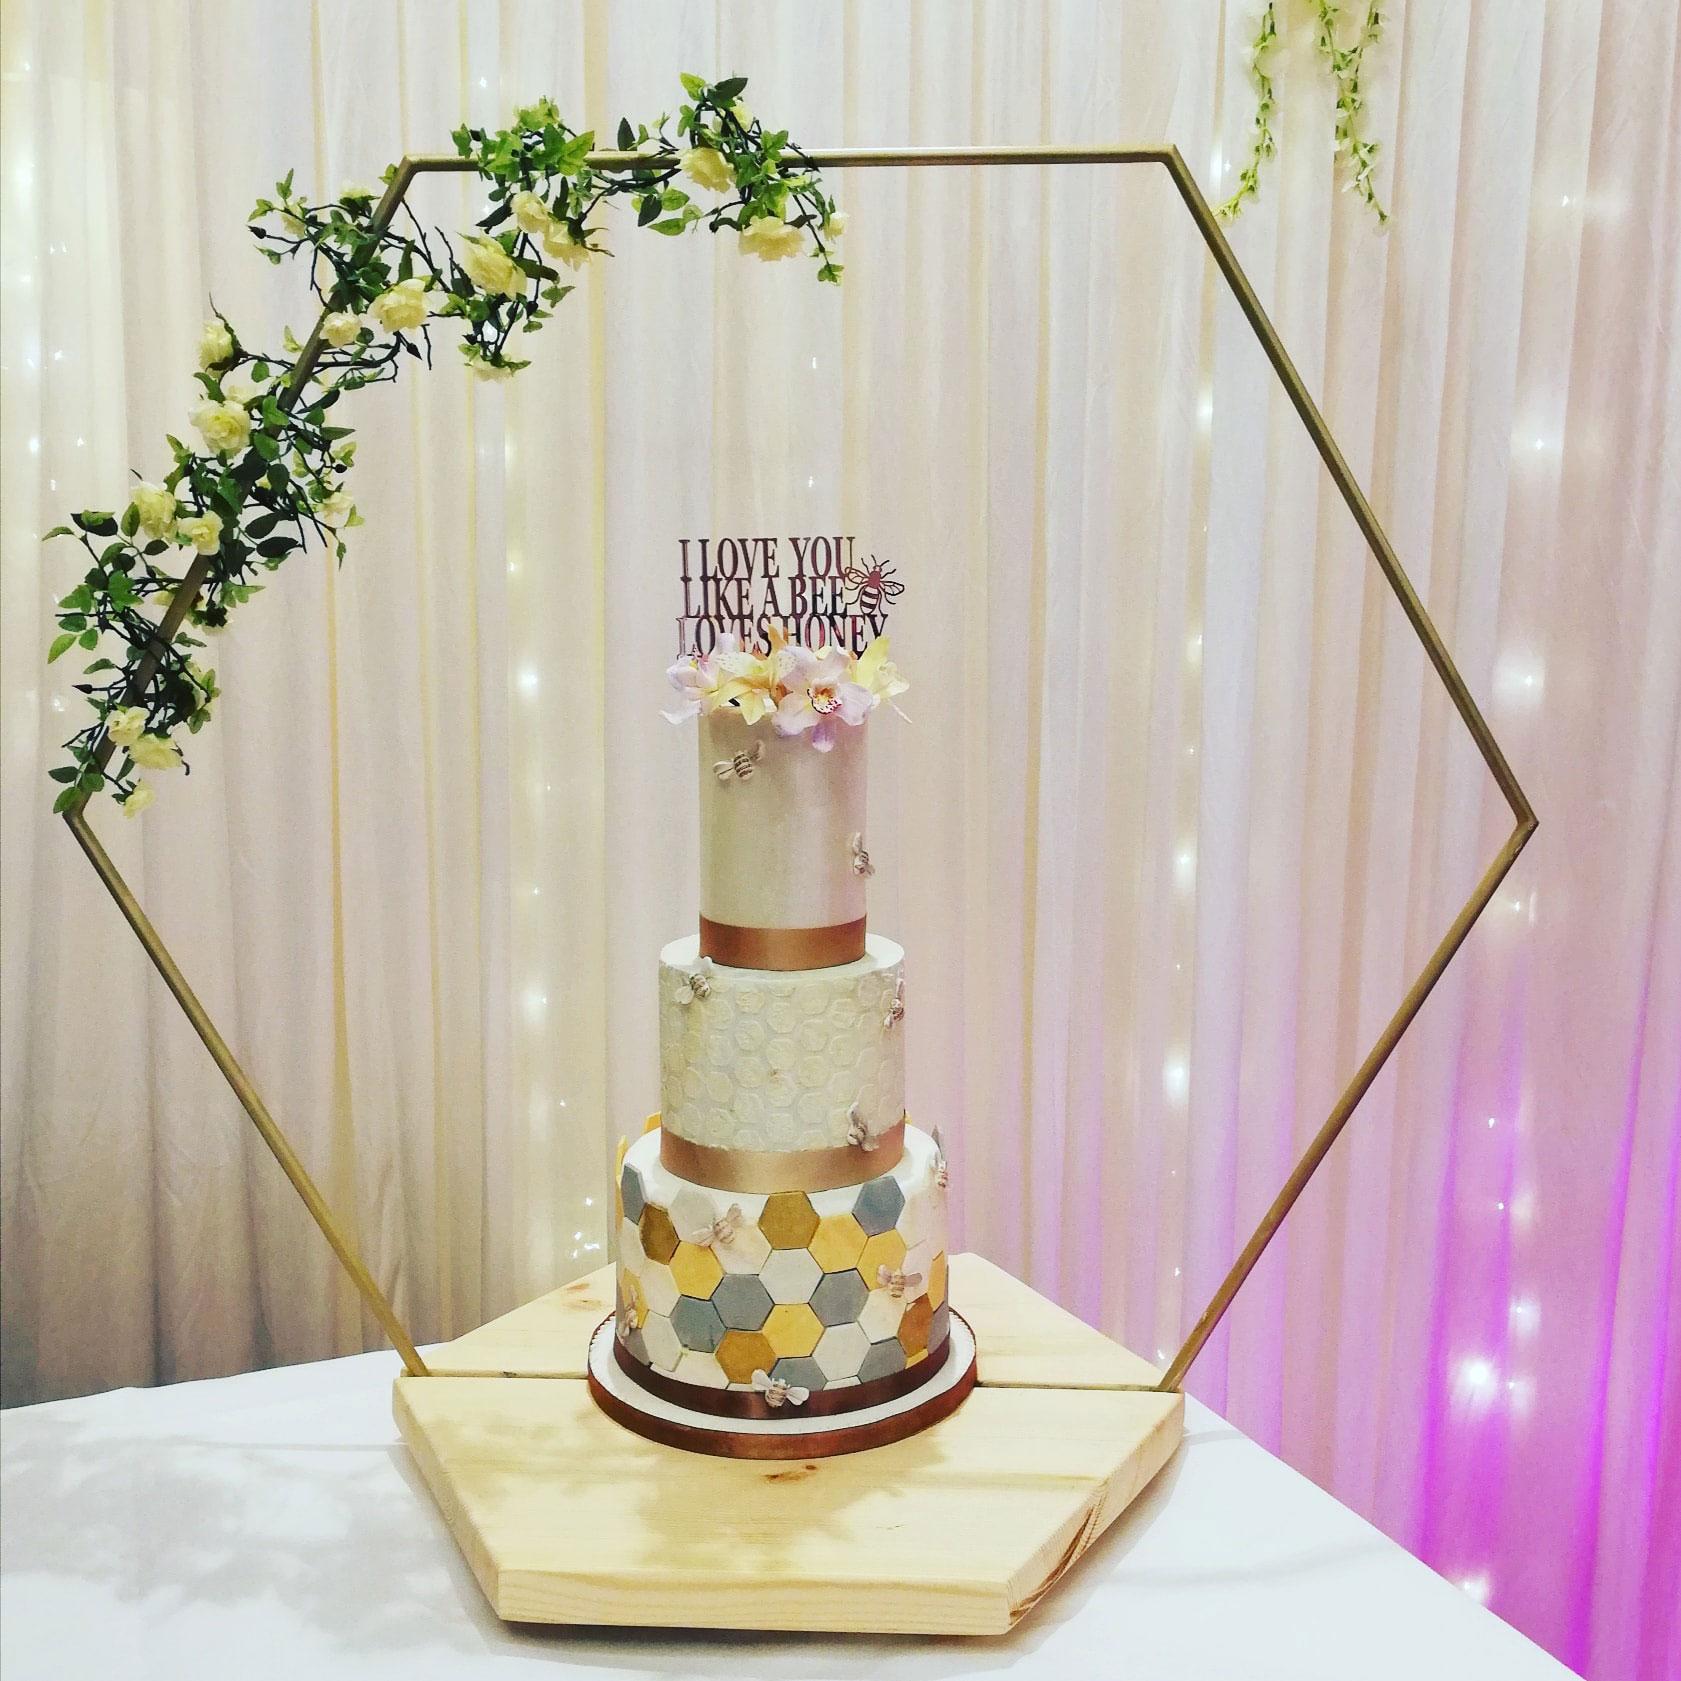 Bee love cake Holiday Inn Peterborough